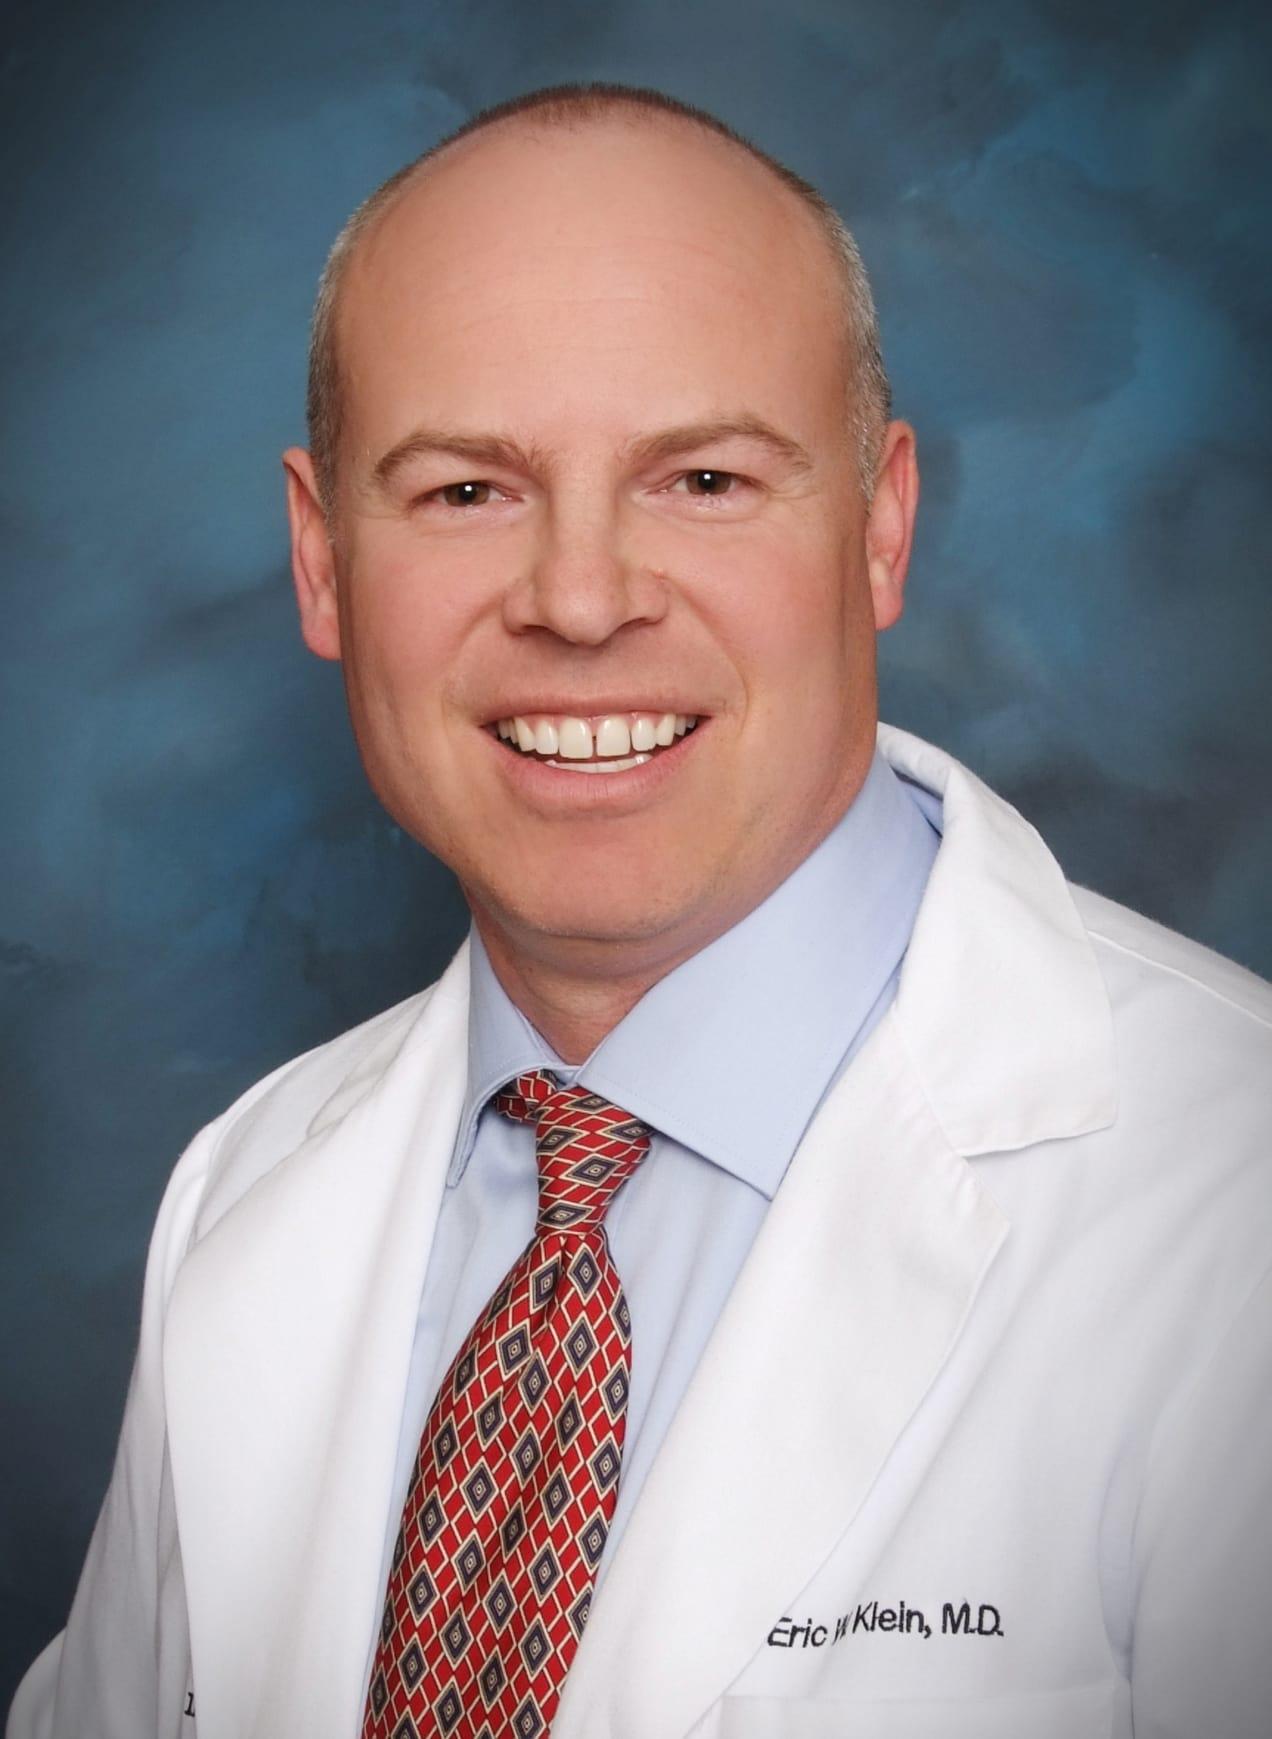 Dr. Eric W Klein MD